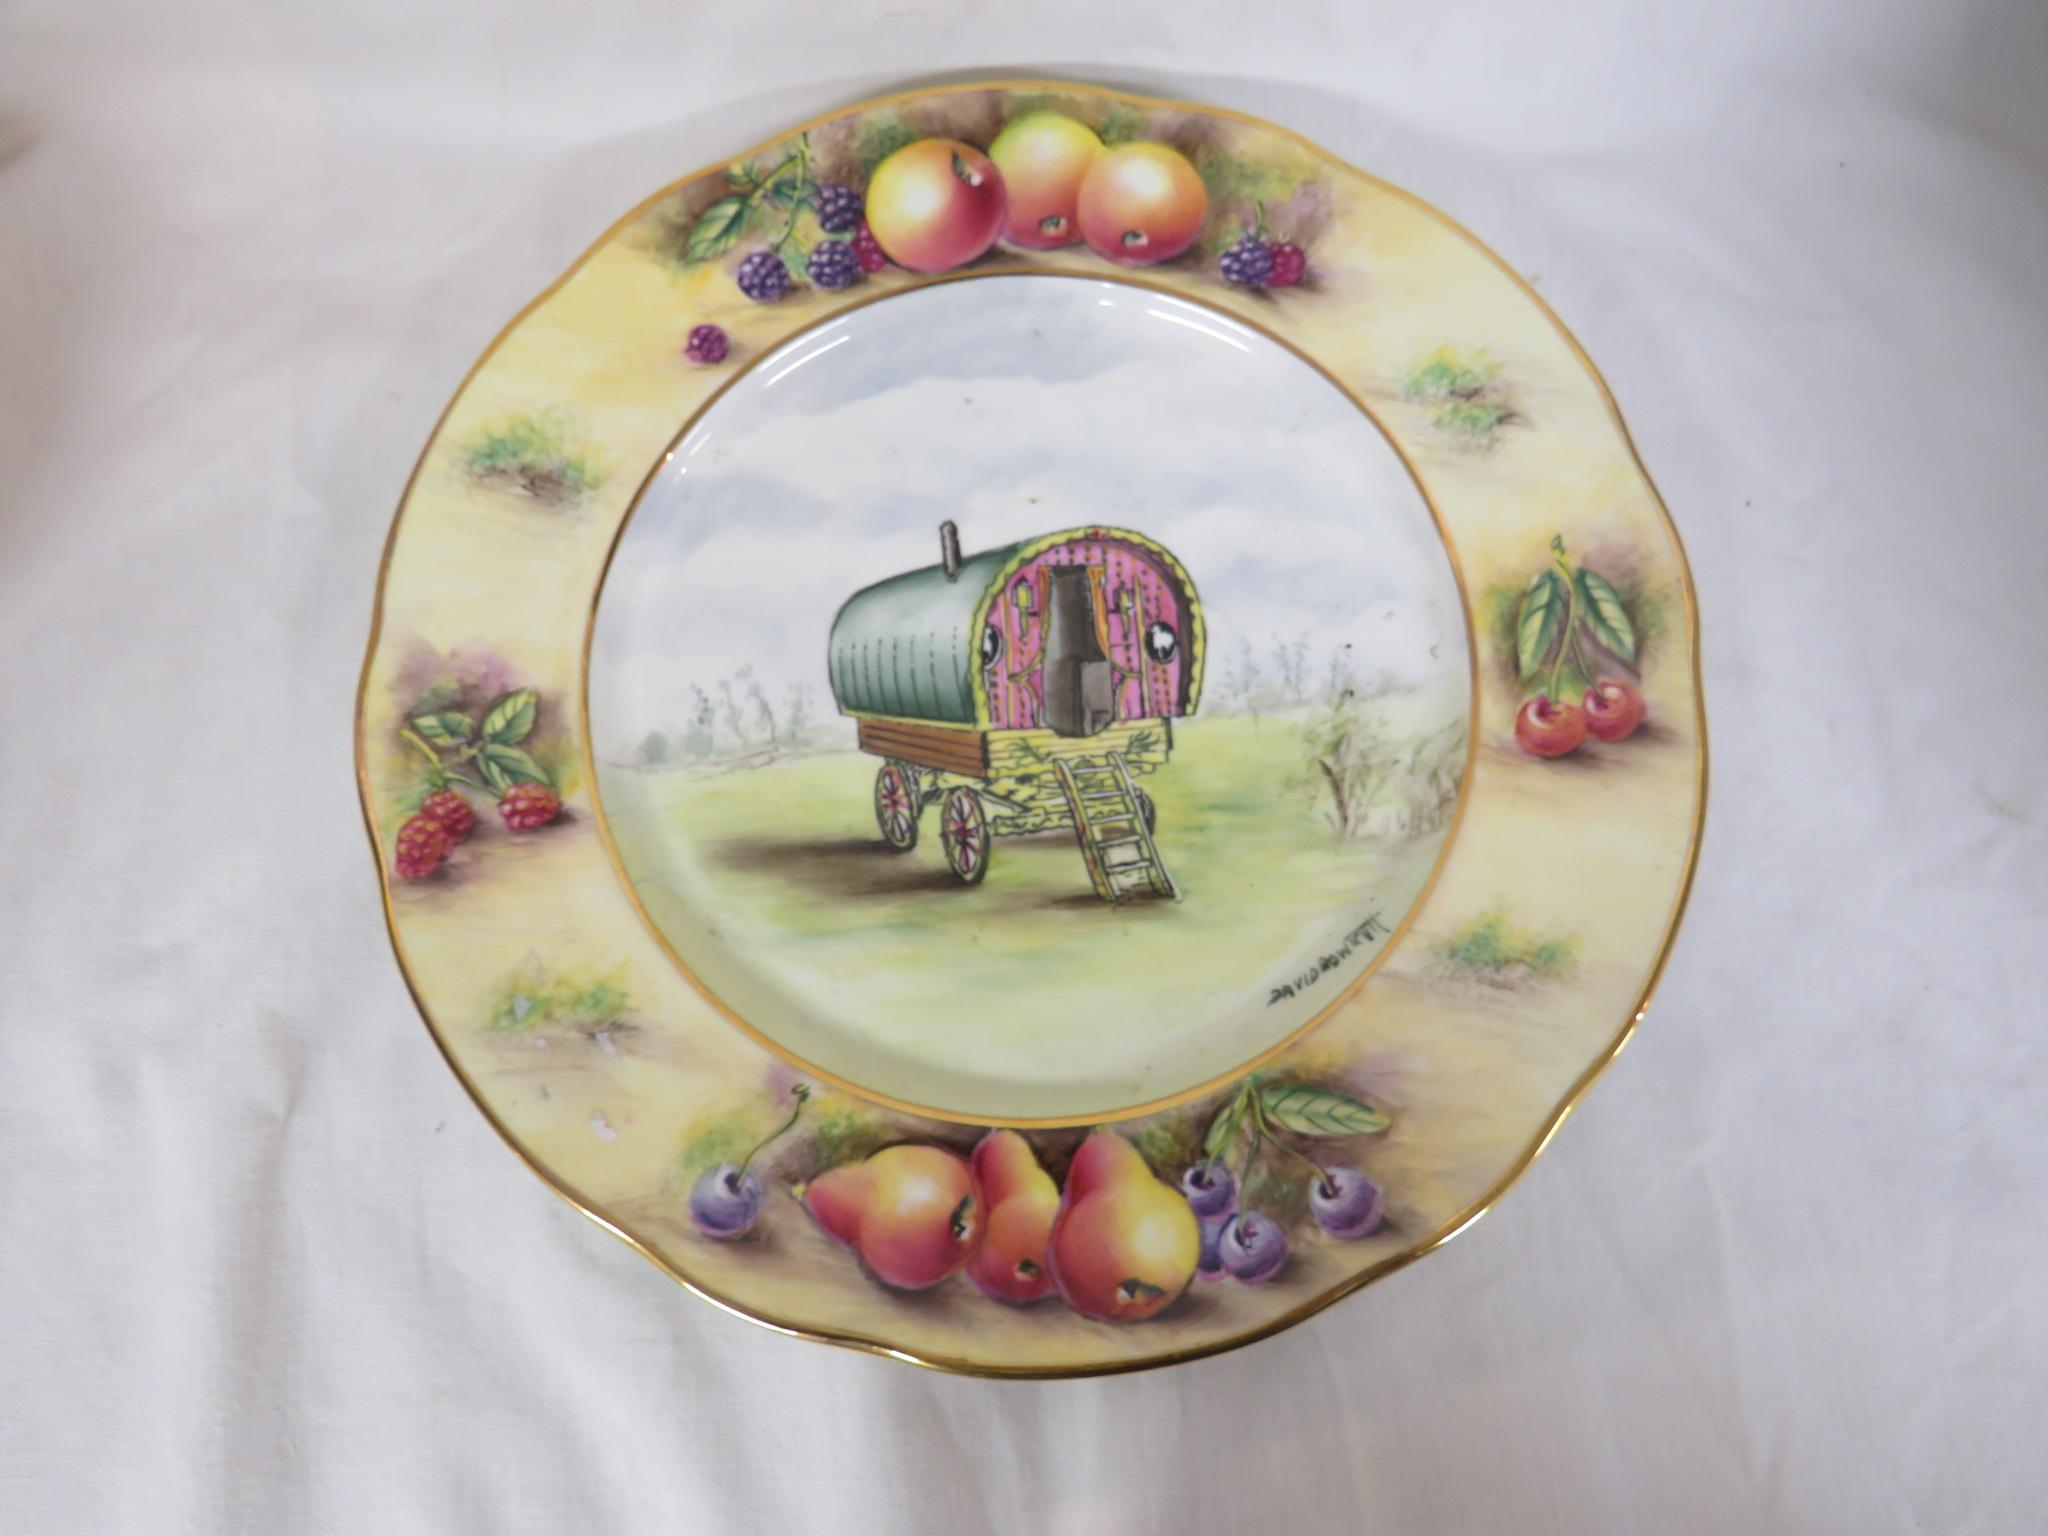 Lot 108 - Three D.R.B. bone china hand painted plates by David Bowkett depicting gypsy wagons, diameter 26cm